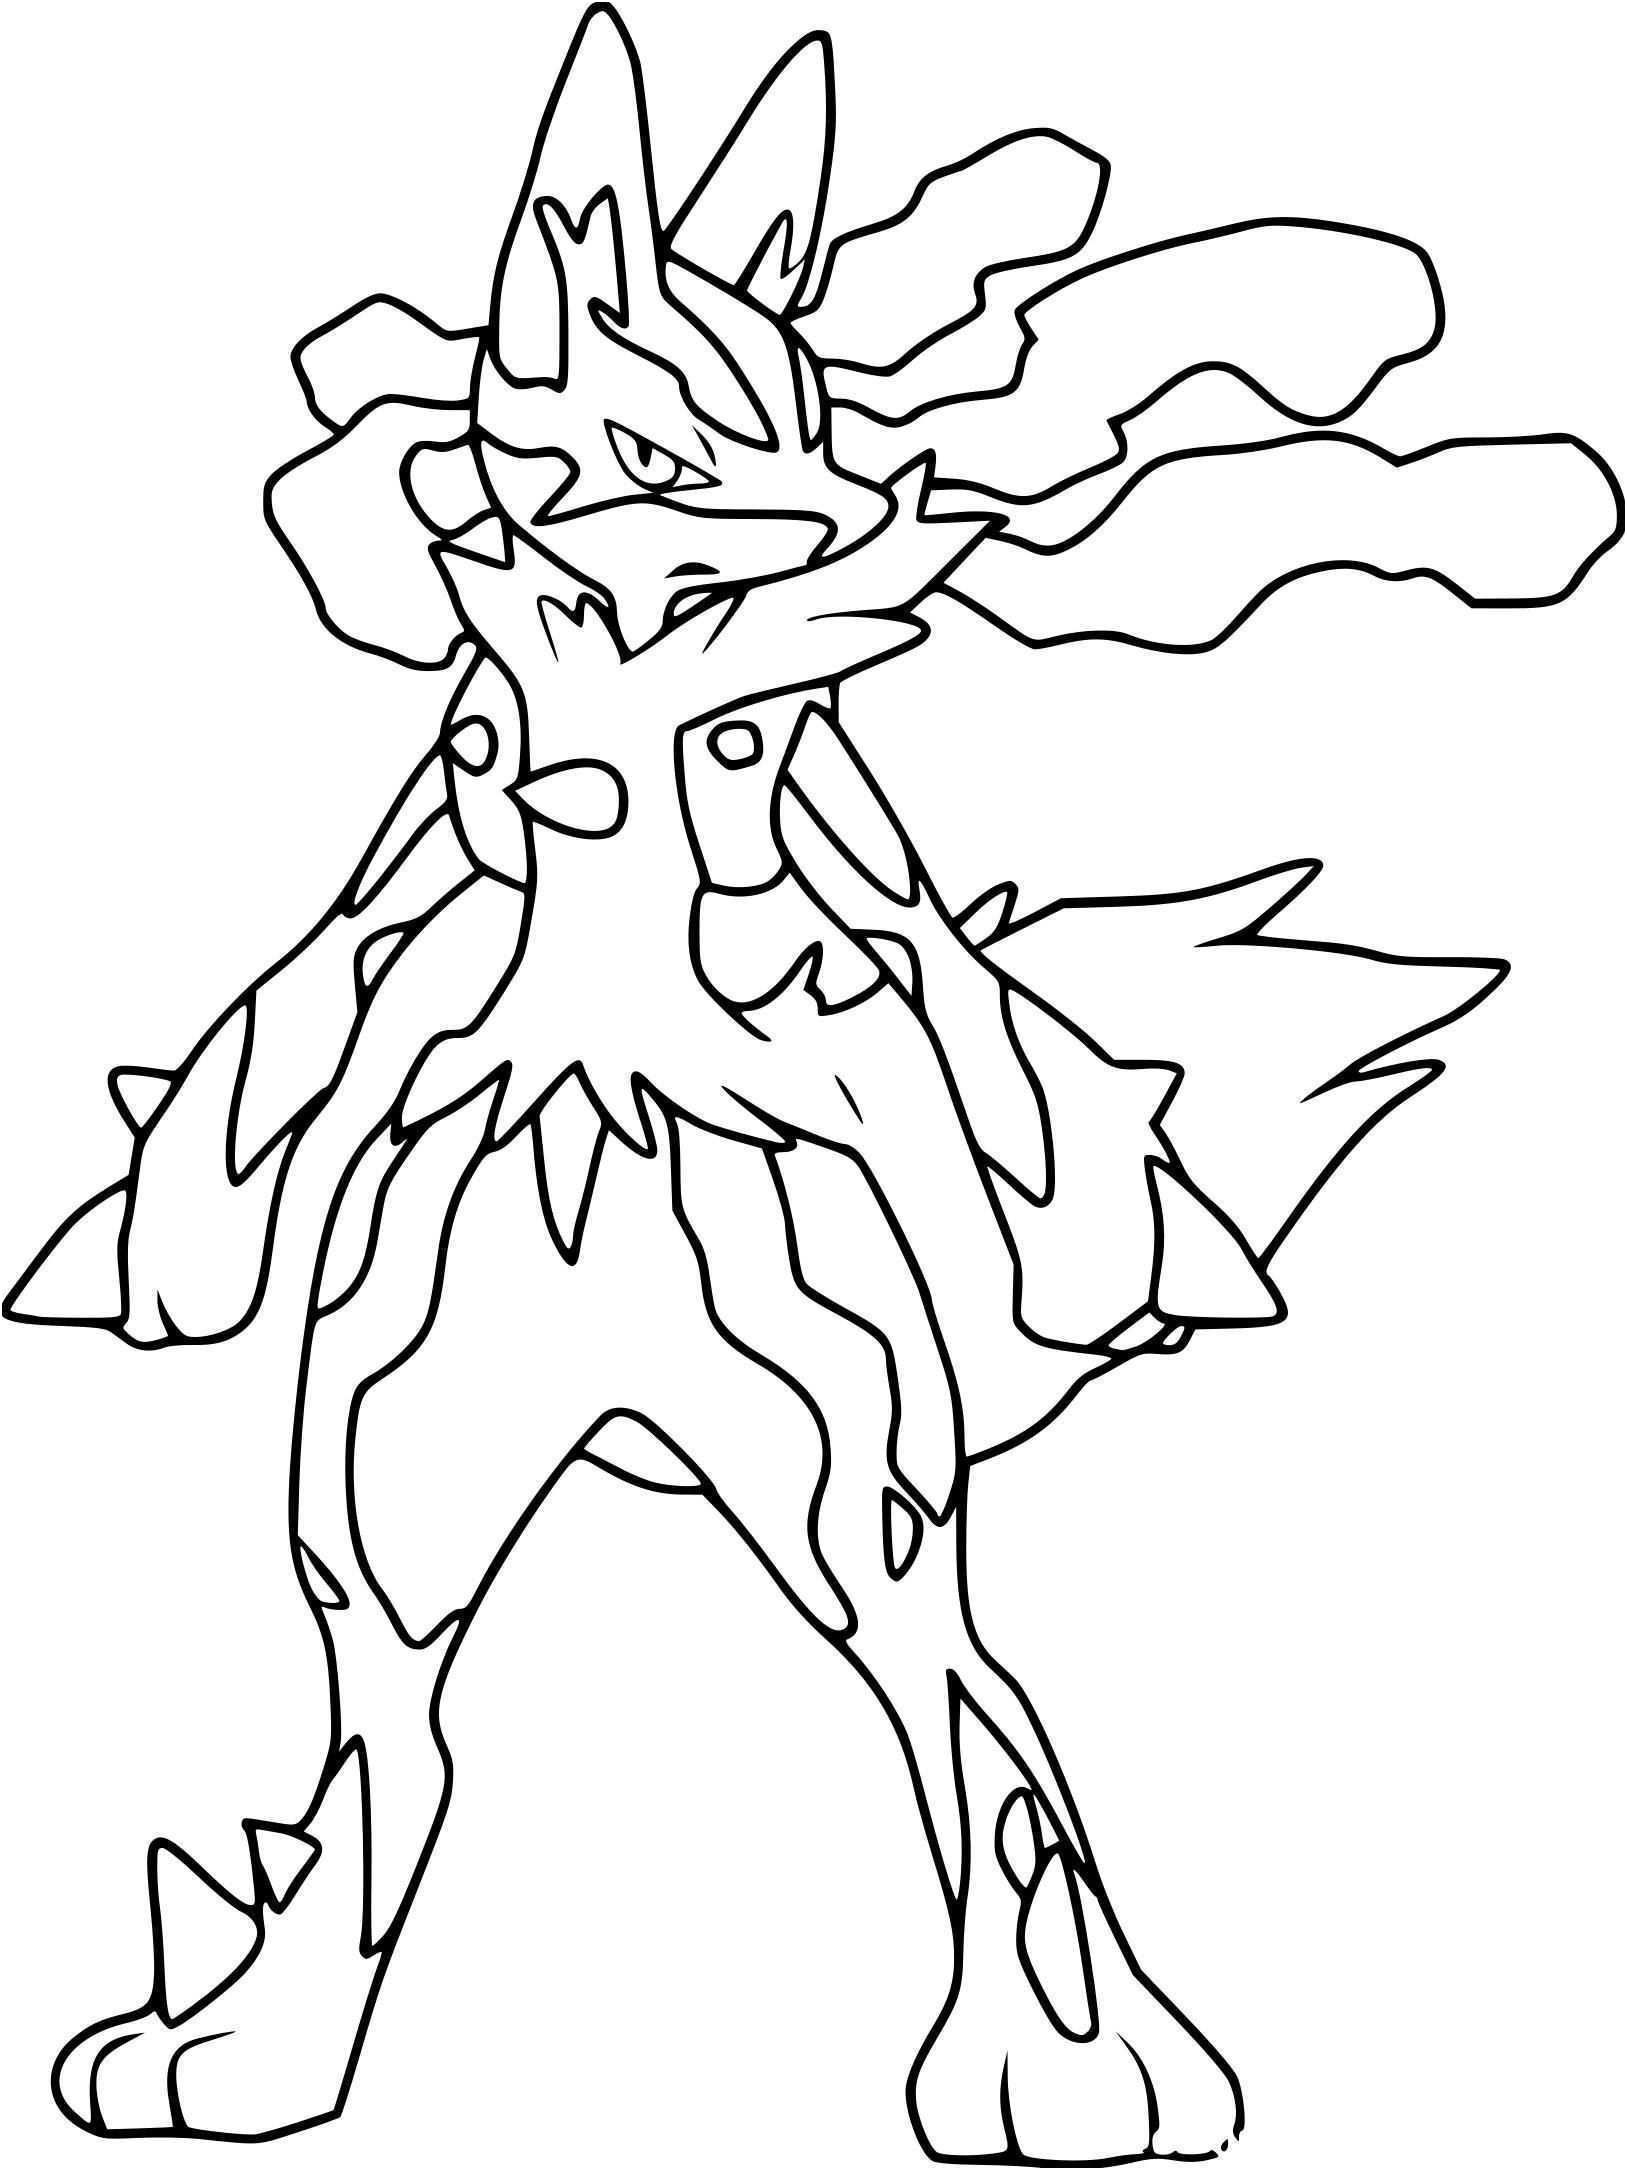 Coloriage Pokemon Mega Evolution Coloriage Pokemon Coloriage